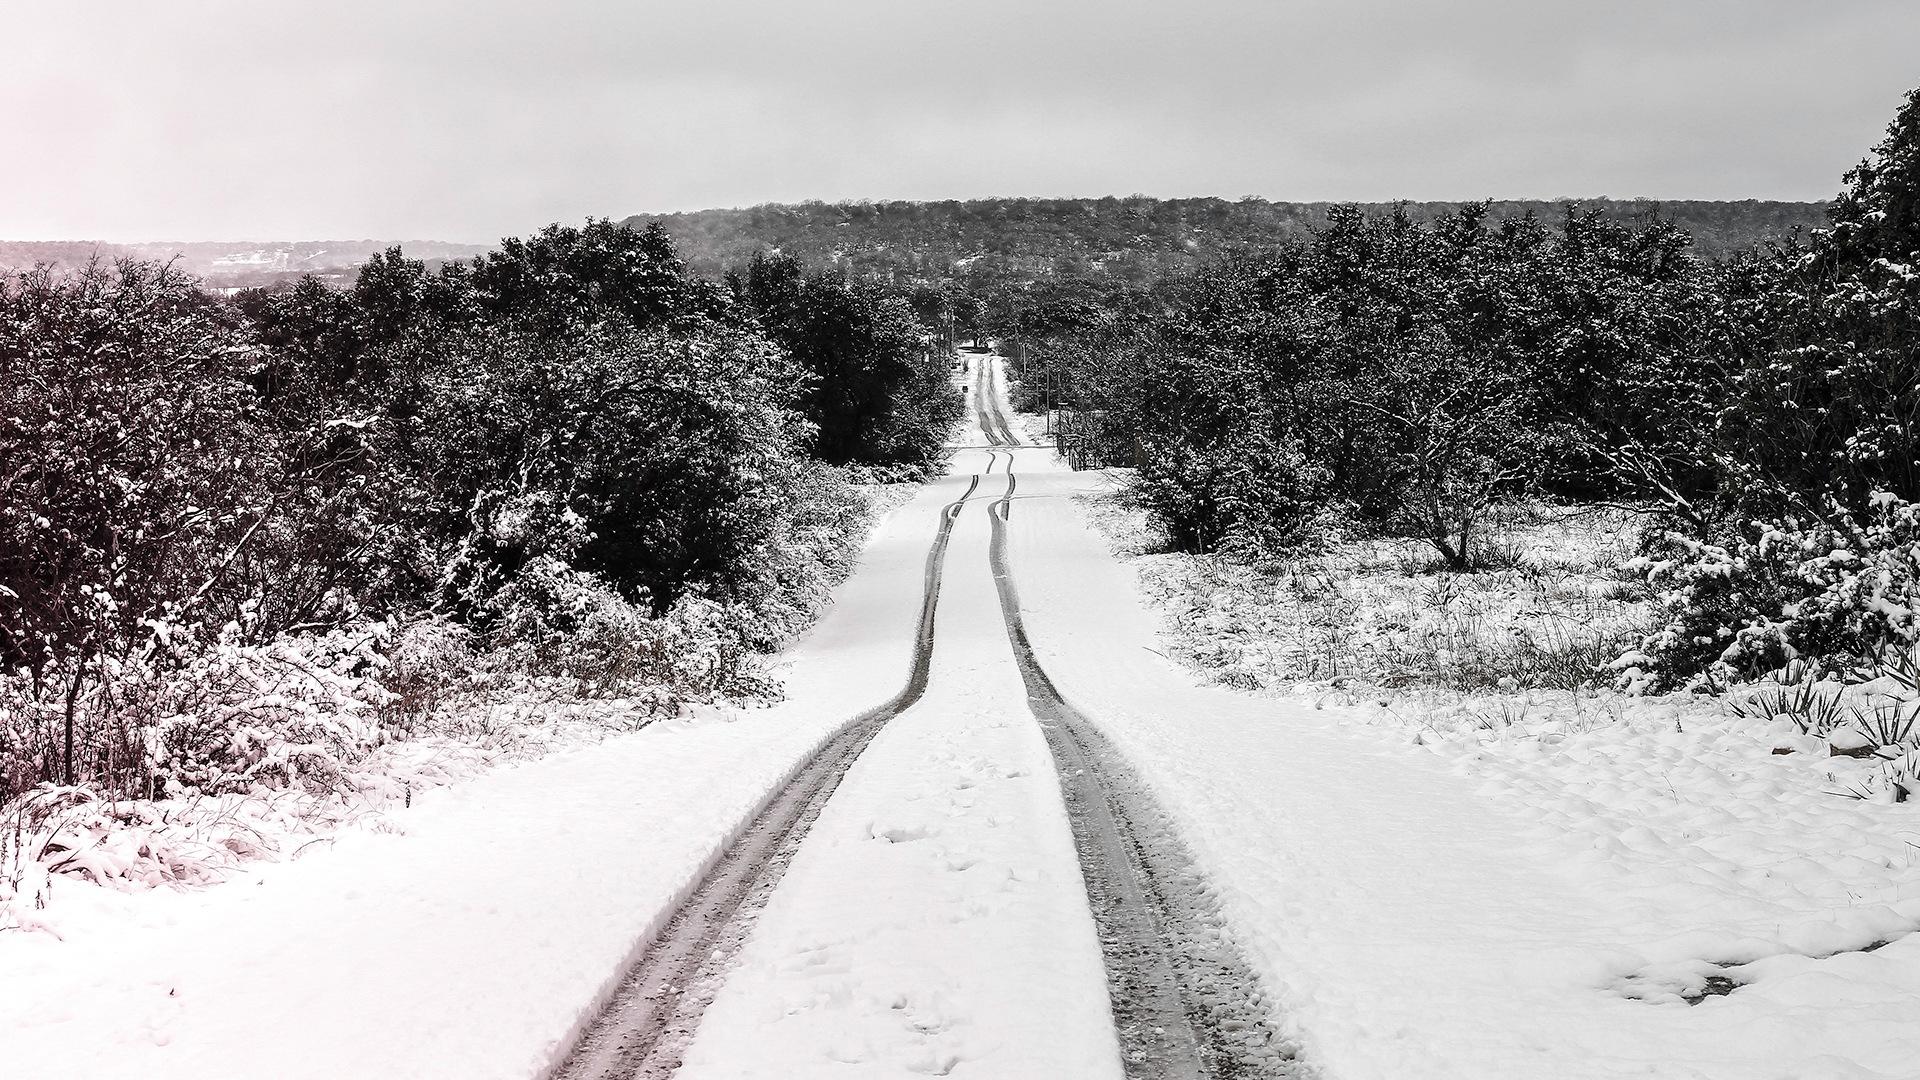 Snowy Road by Lane L Gibson